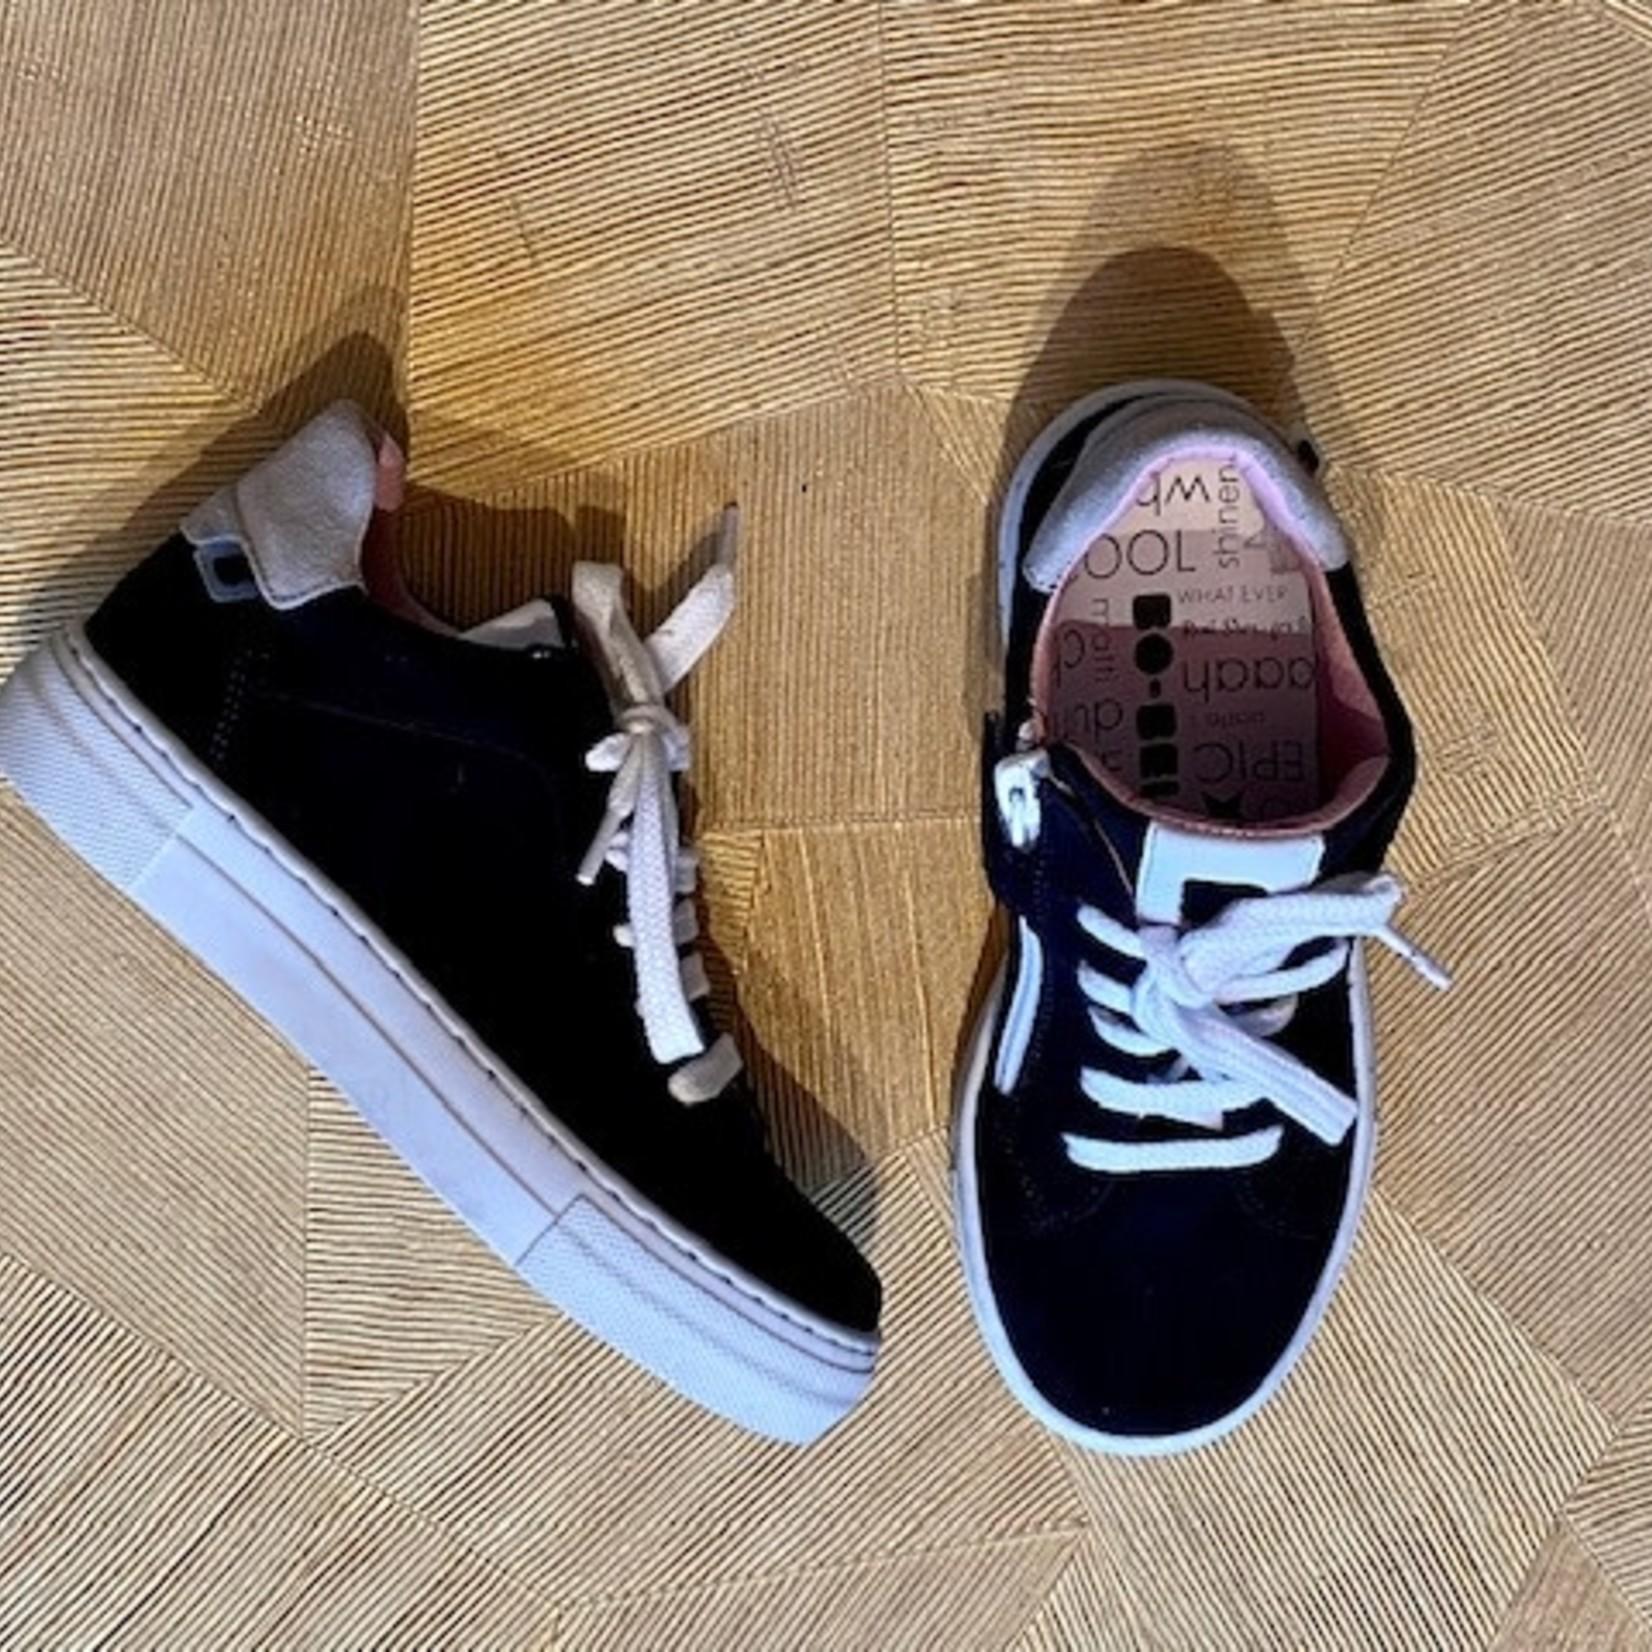 BO-BELL BO-BELL veter en rits schoen donkerblauw